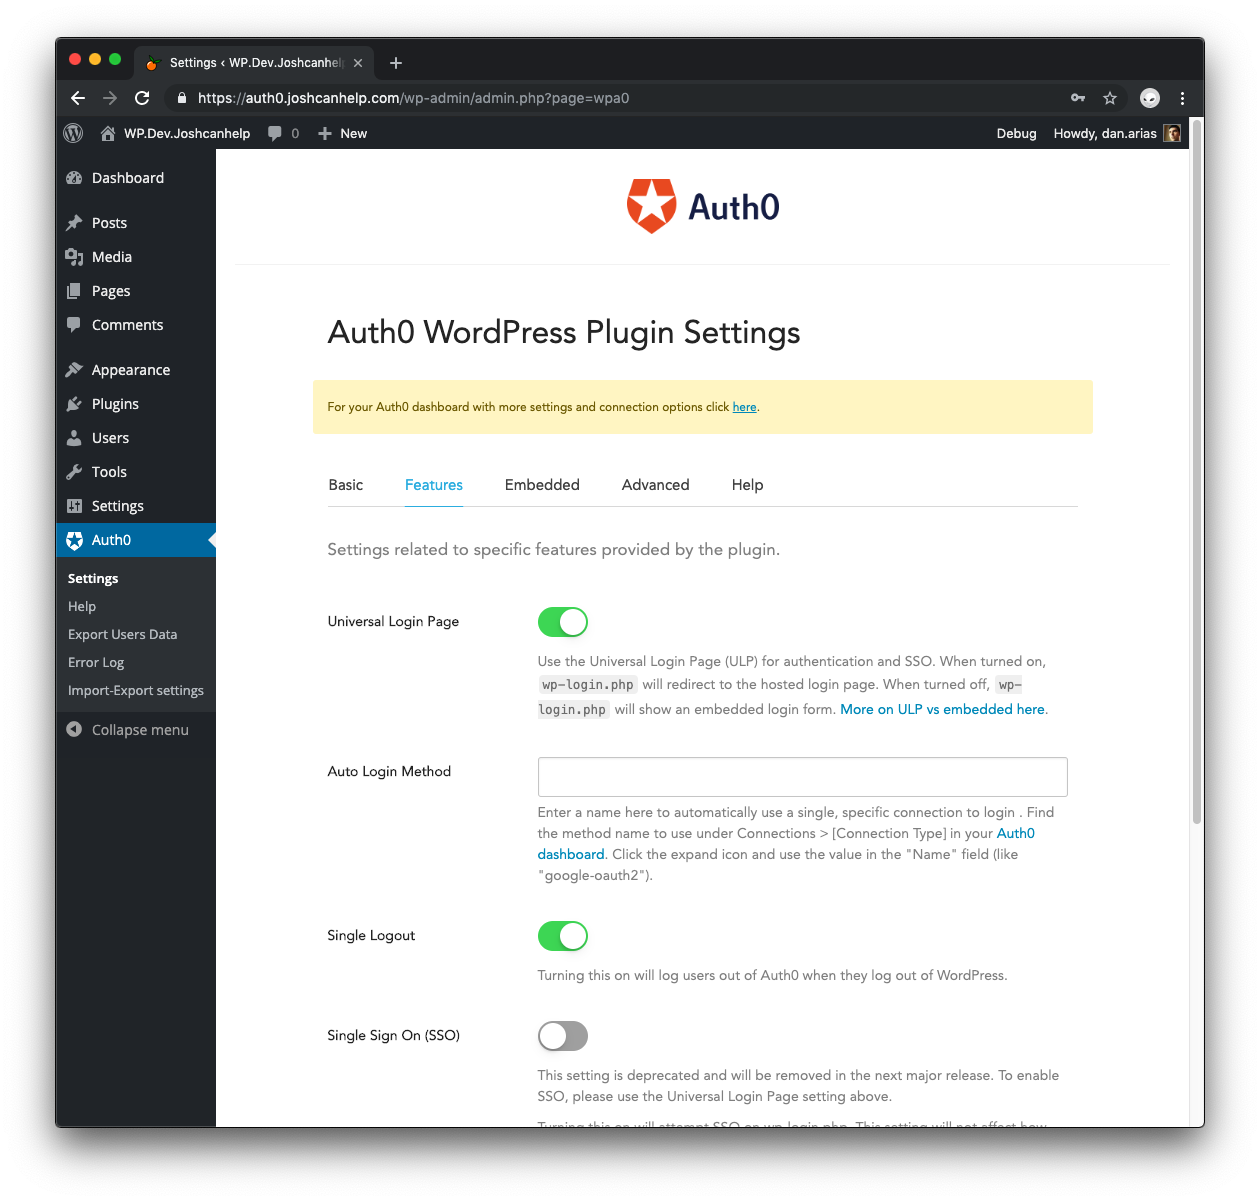 Auth0 WordPress Plugin Settings